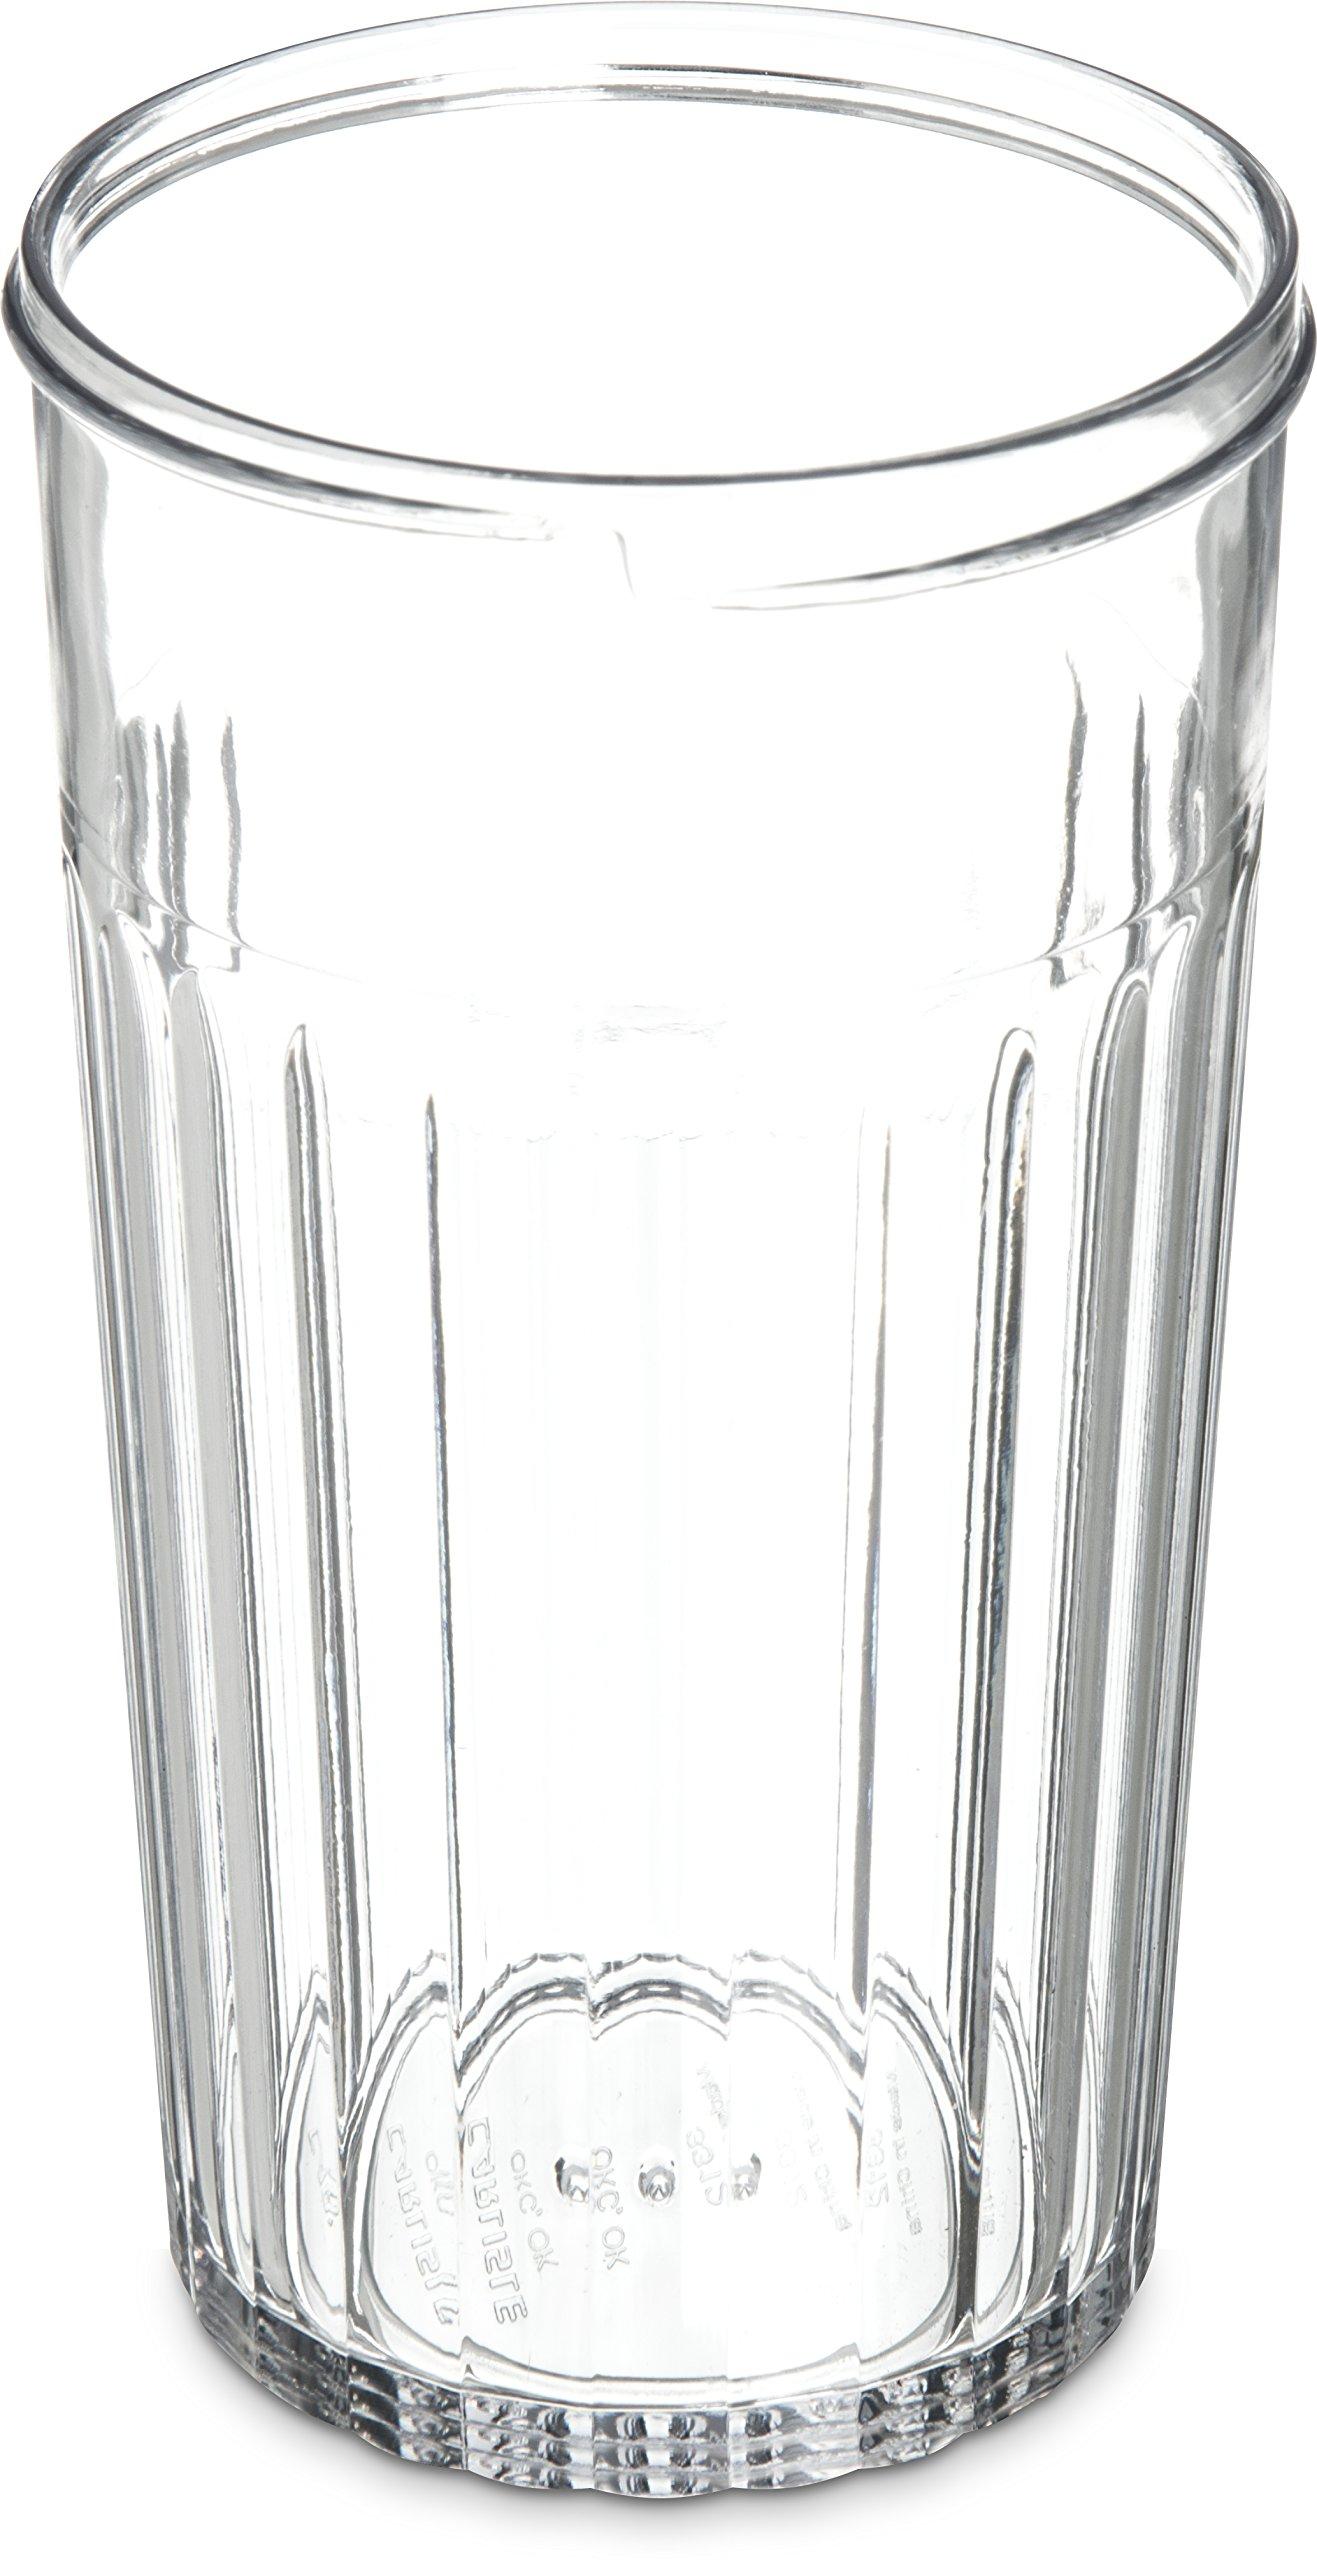 Carlisle 331207 SAN Base Sugar Pour/Cheese Shaker, 12-oz. Capacity, Clear (Case of 72) by Carlisle